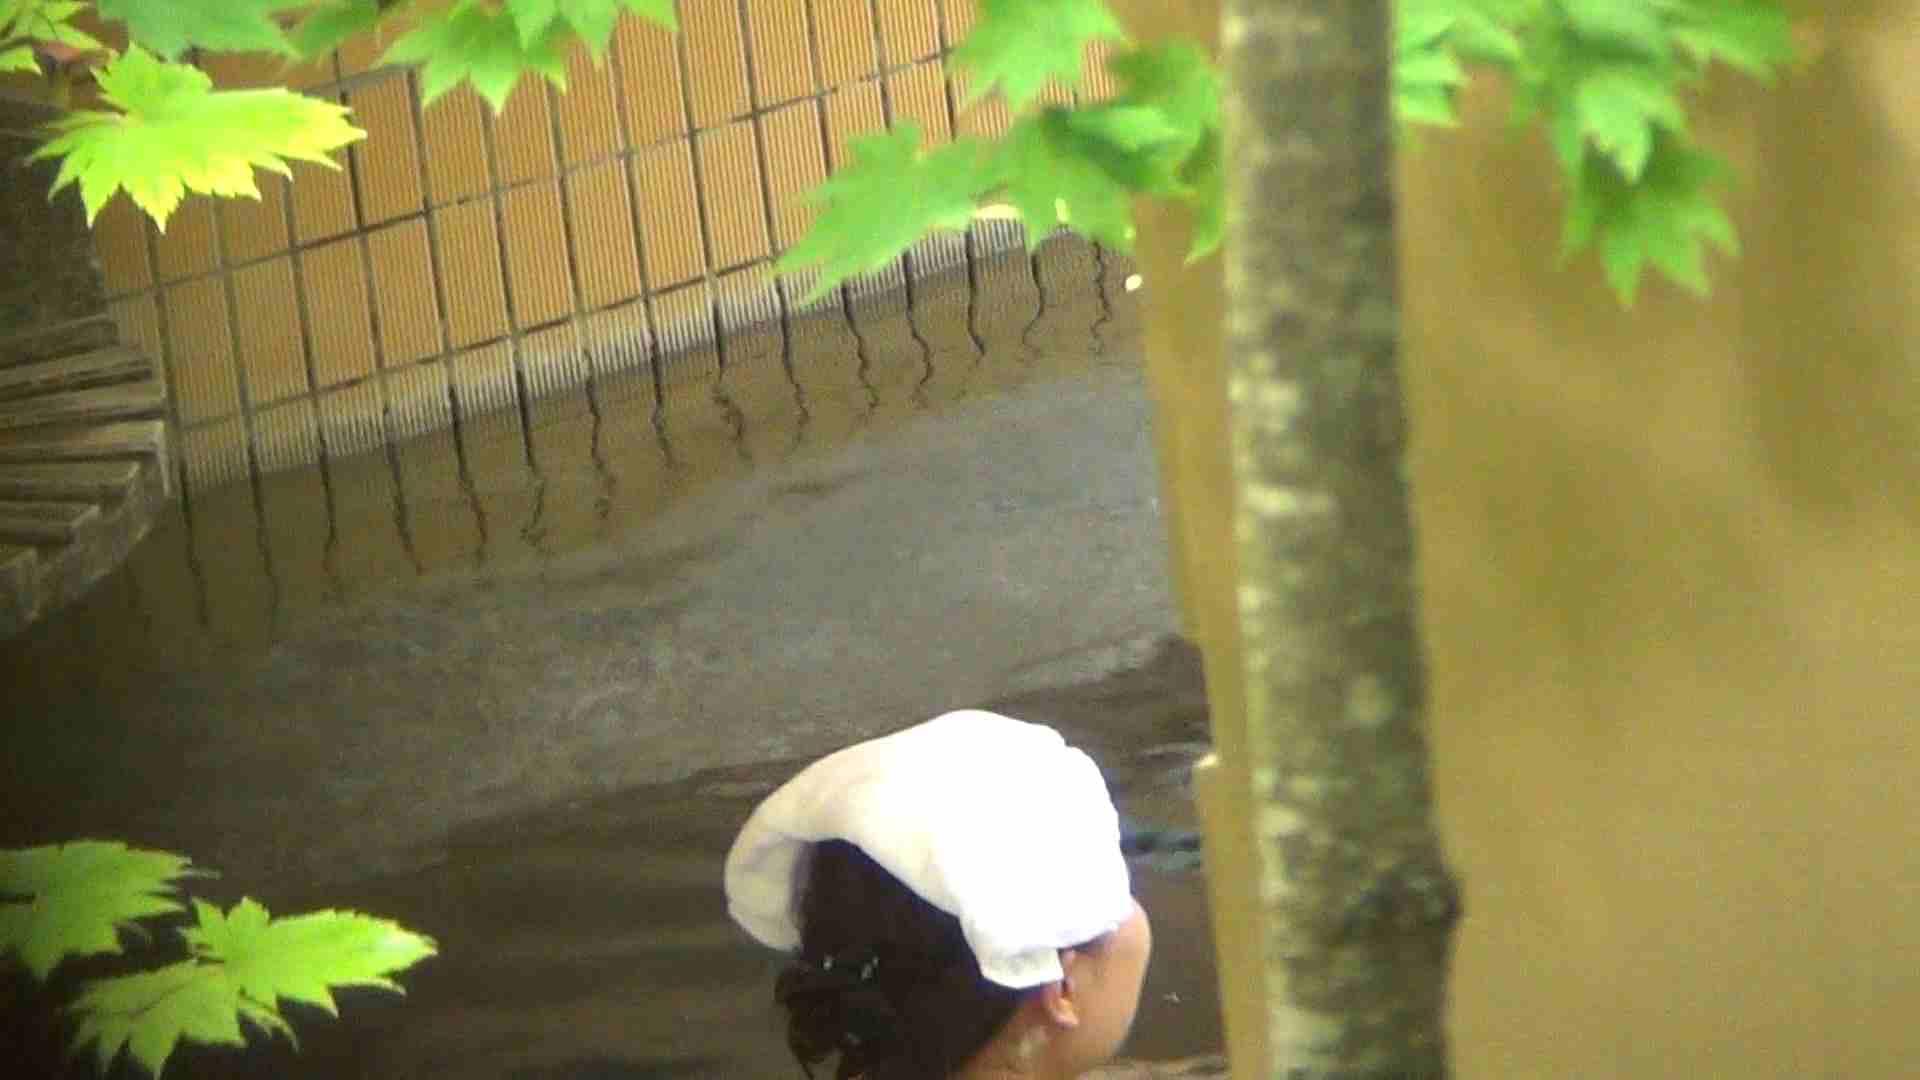 Aquaな露天風呂Vol.264 盗撮   OLセックス  82画像 43